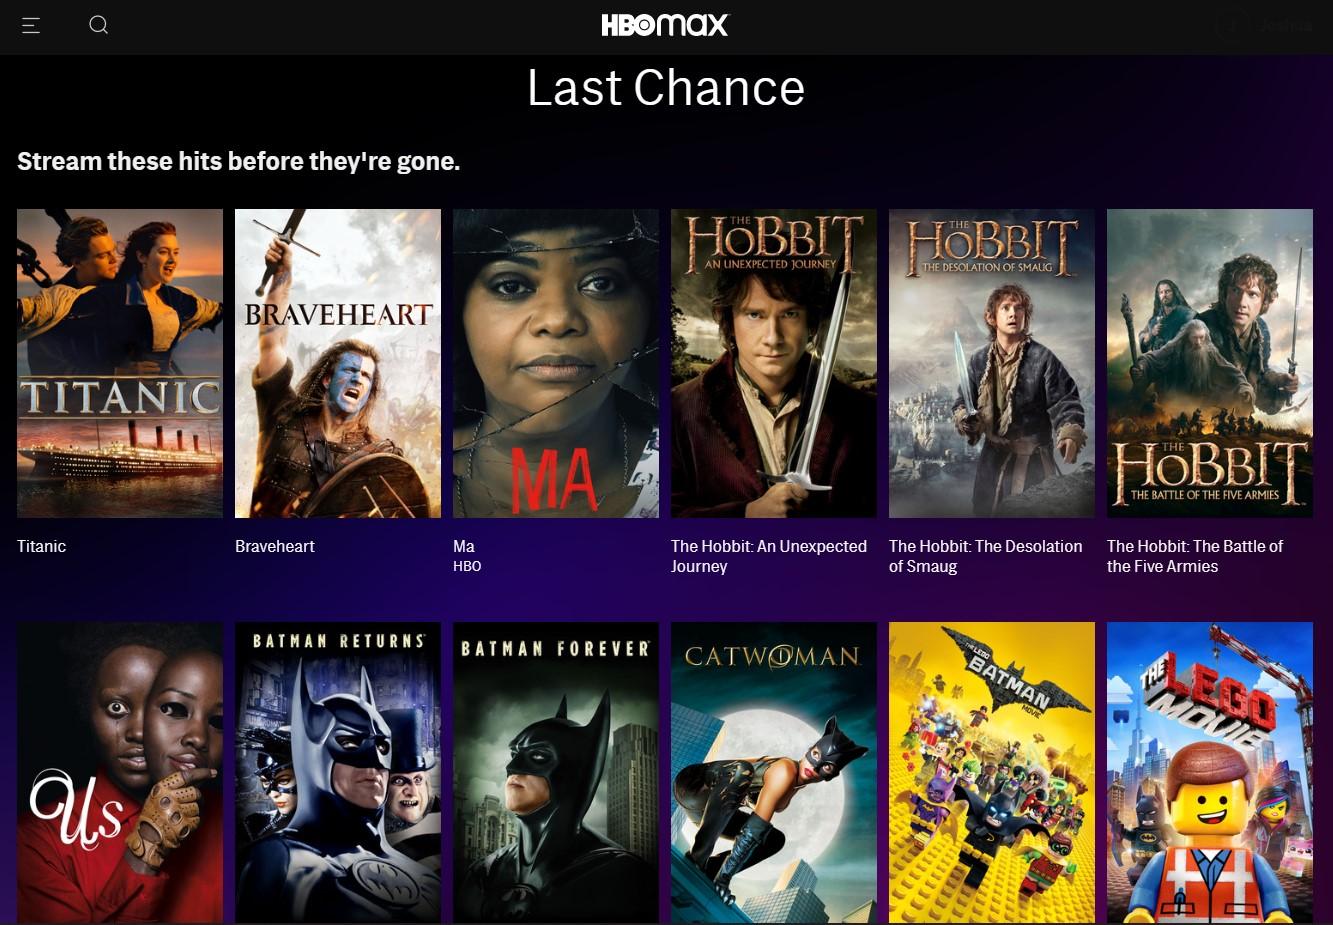 HBO Max last chance menu